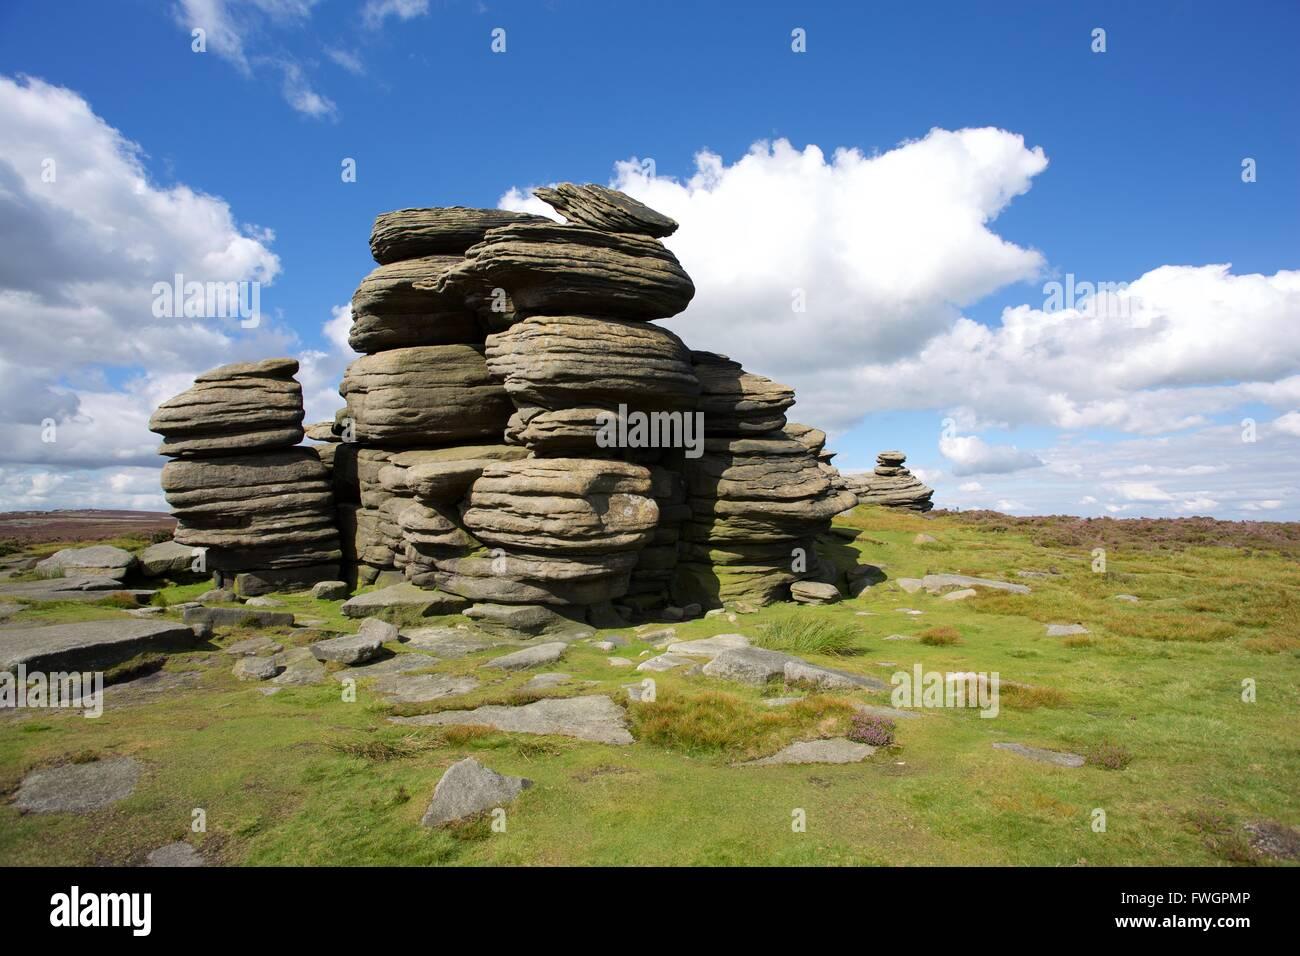 Salt Cellar Rock on Derwent Edge, Peak District National Park, Derbyshire, England, United Kingdom, Europe - Stock Image